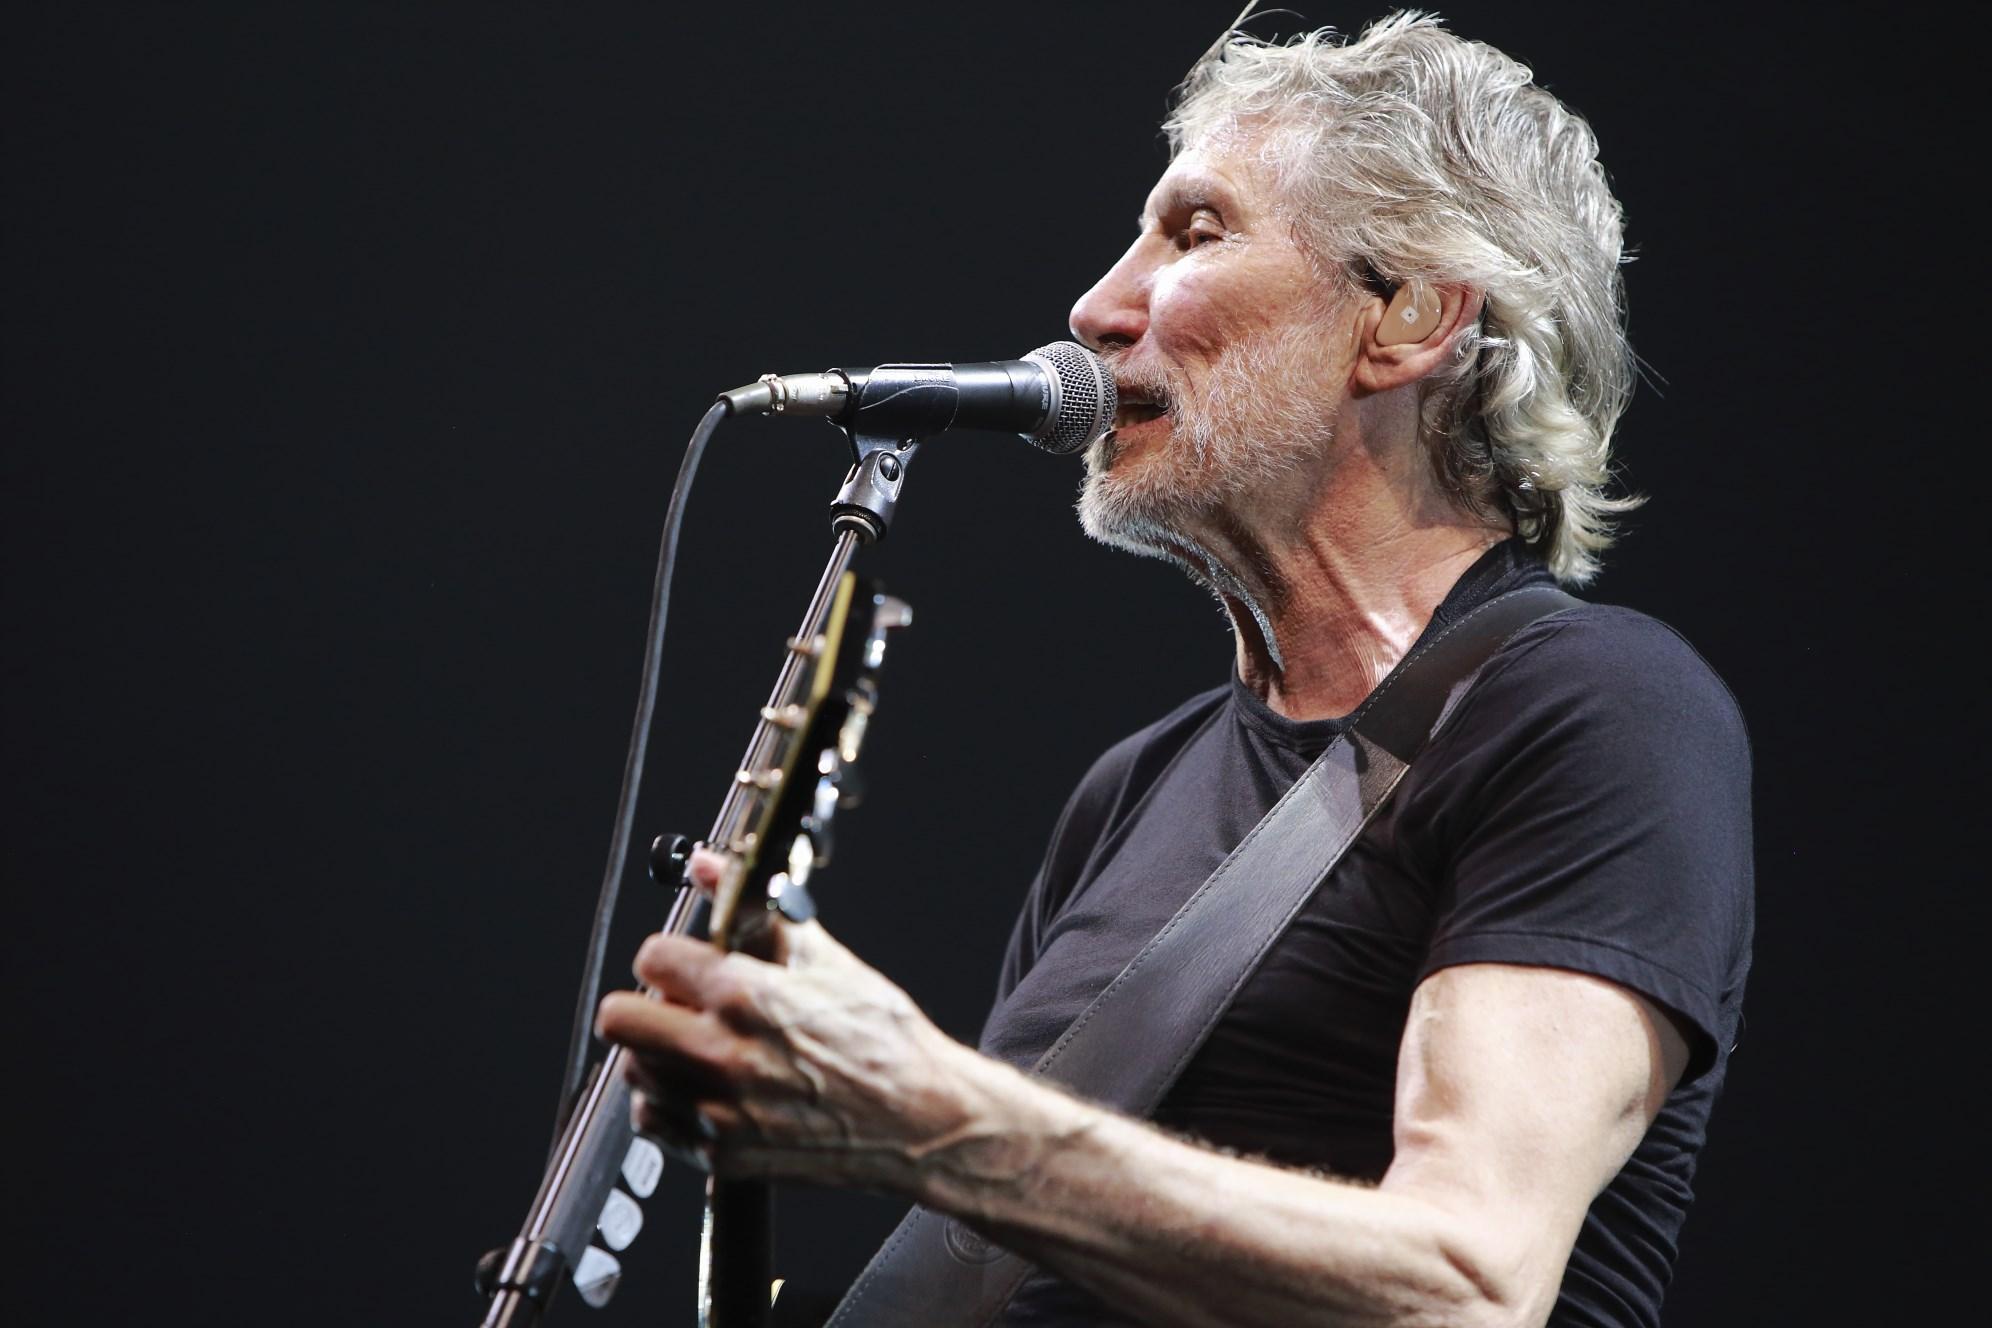 roger waters concerto milano 17 aprile 2018